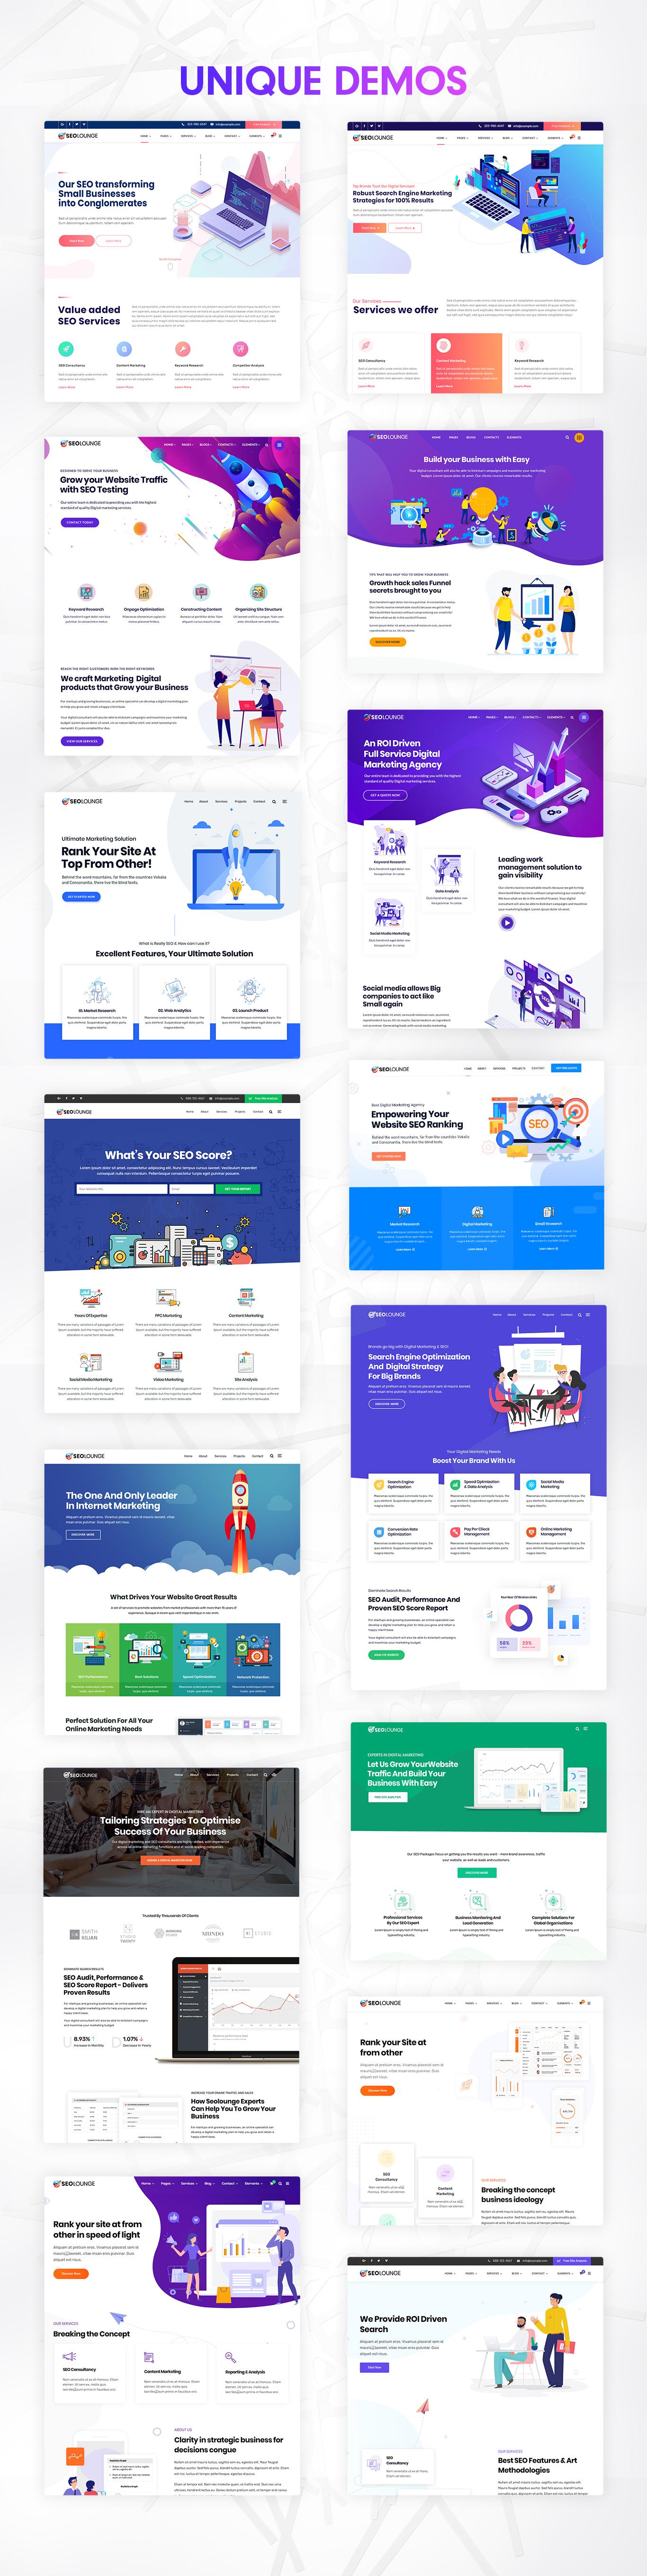 SEOLounge Presentation 004 v2 - SEO Lounge - Digital Marketing Theme